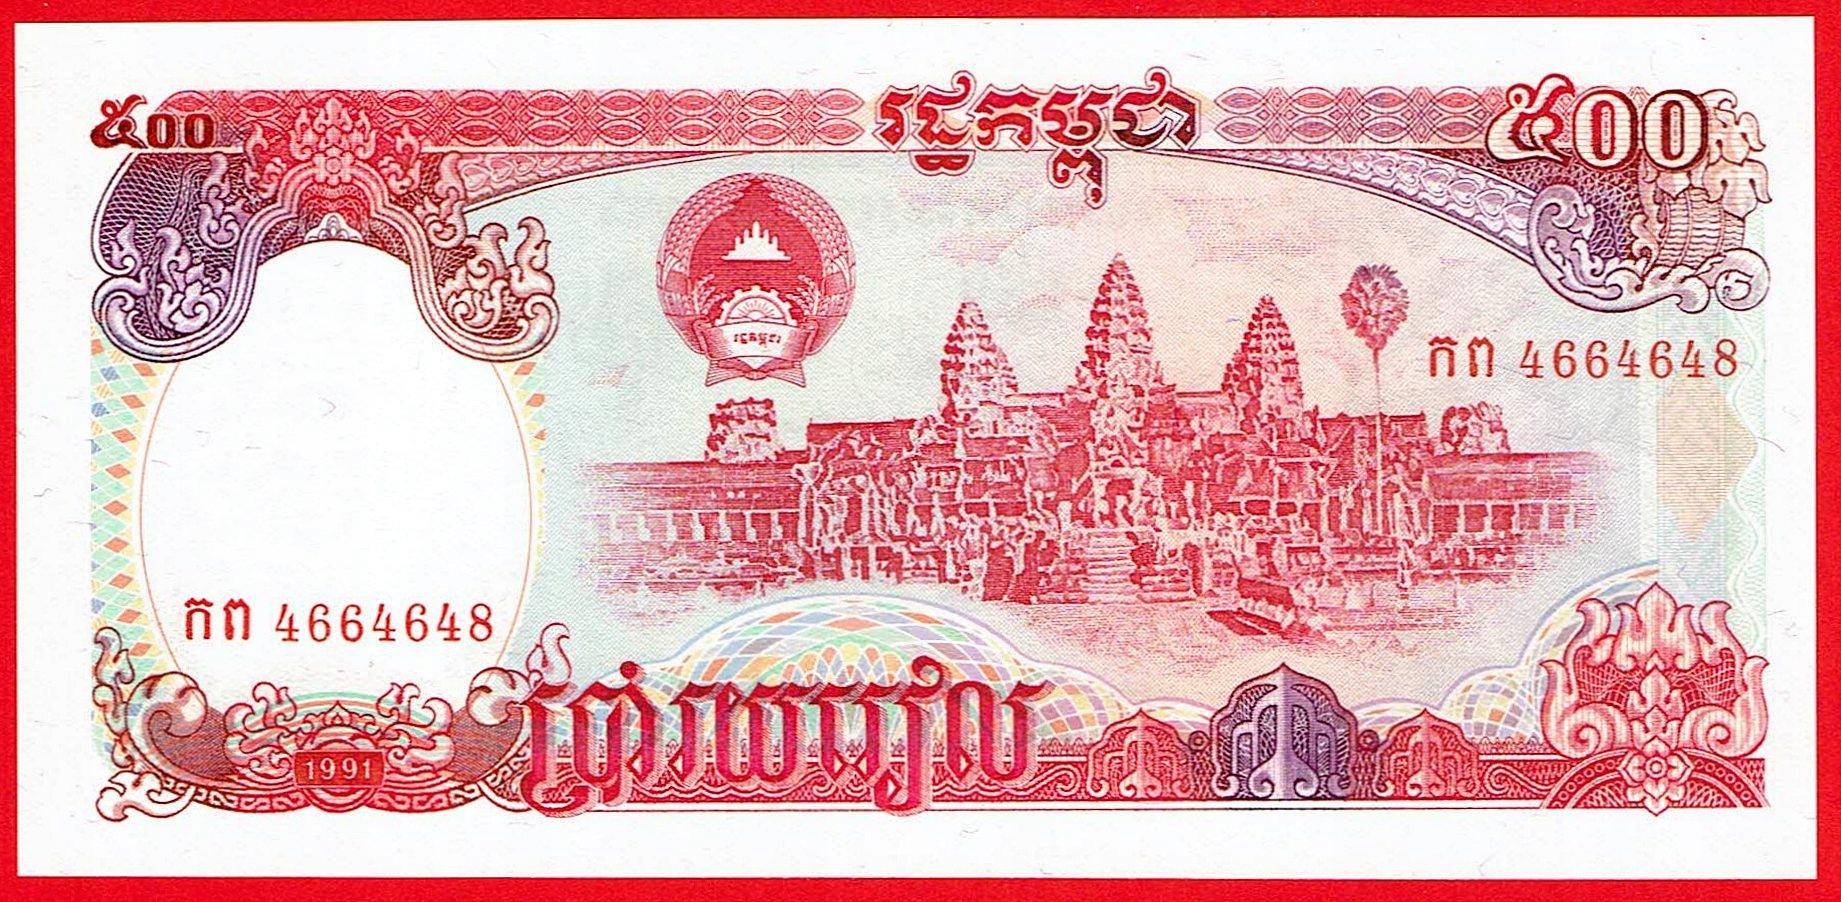 500 RIELS - Камбоджа / Камбоджа 1991 штат UNC